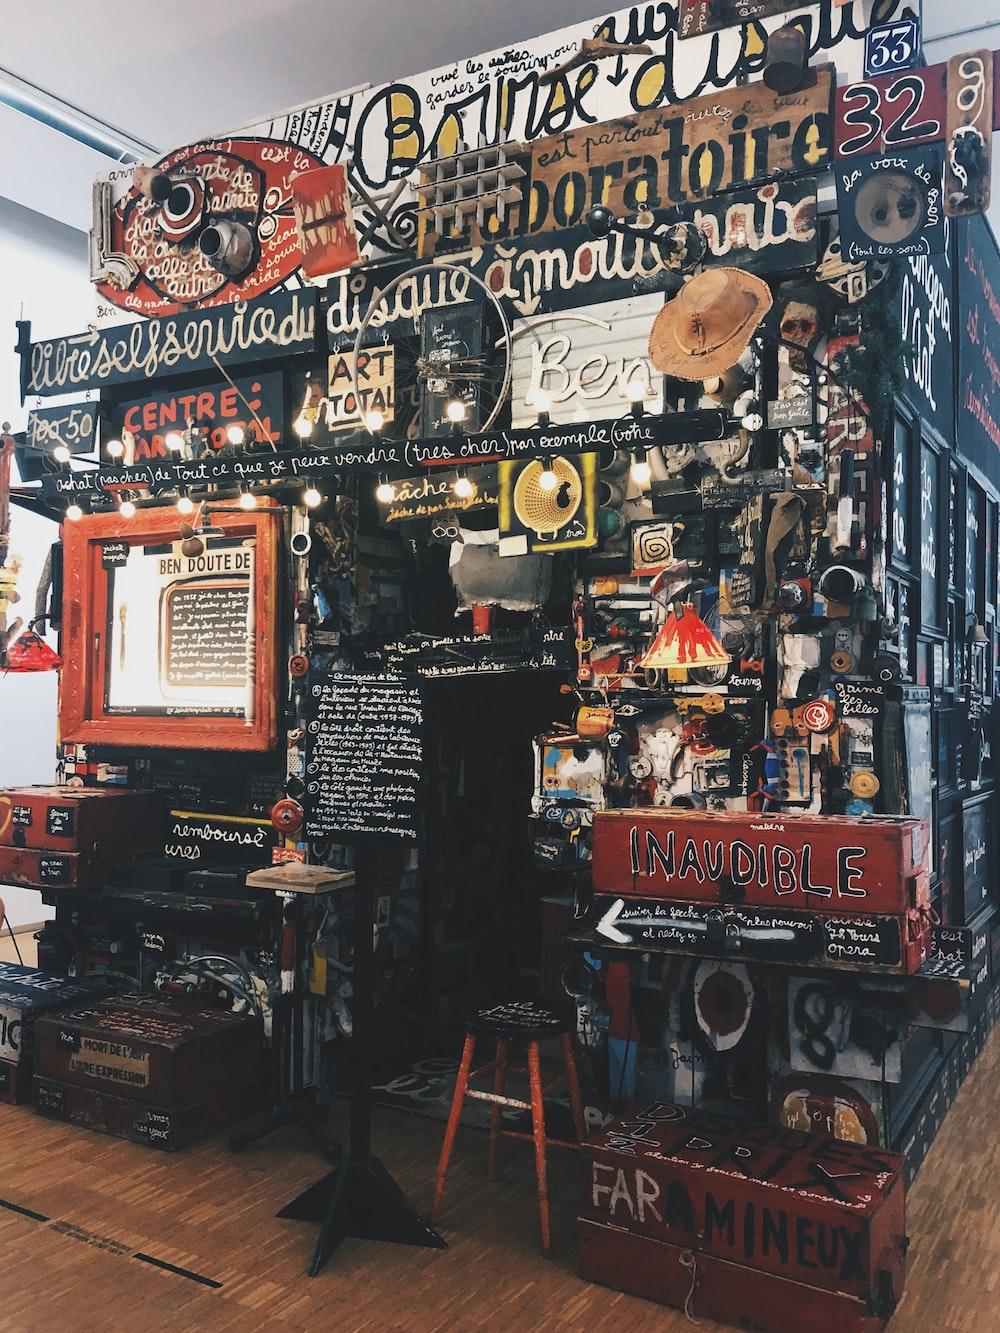 red and black coca cola machine